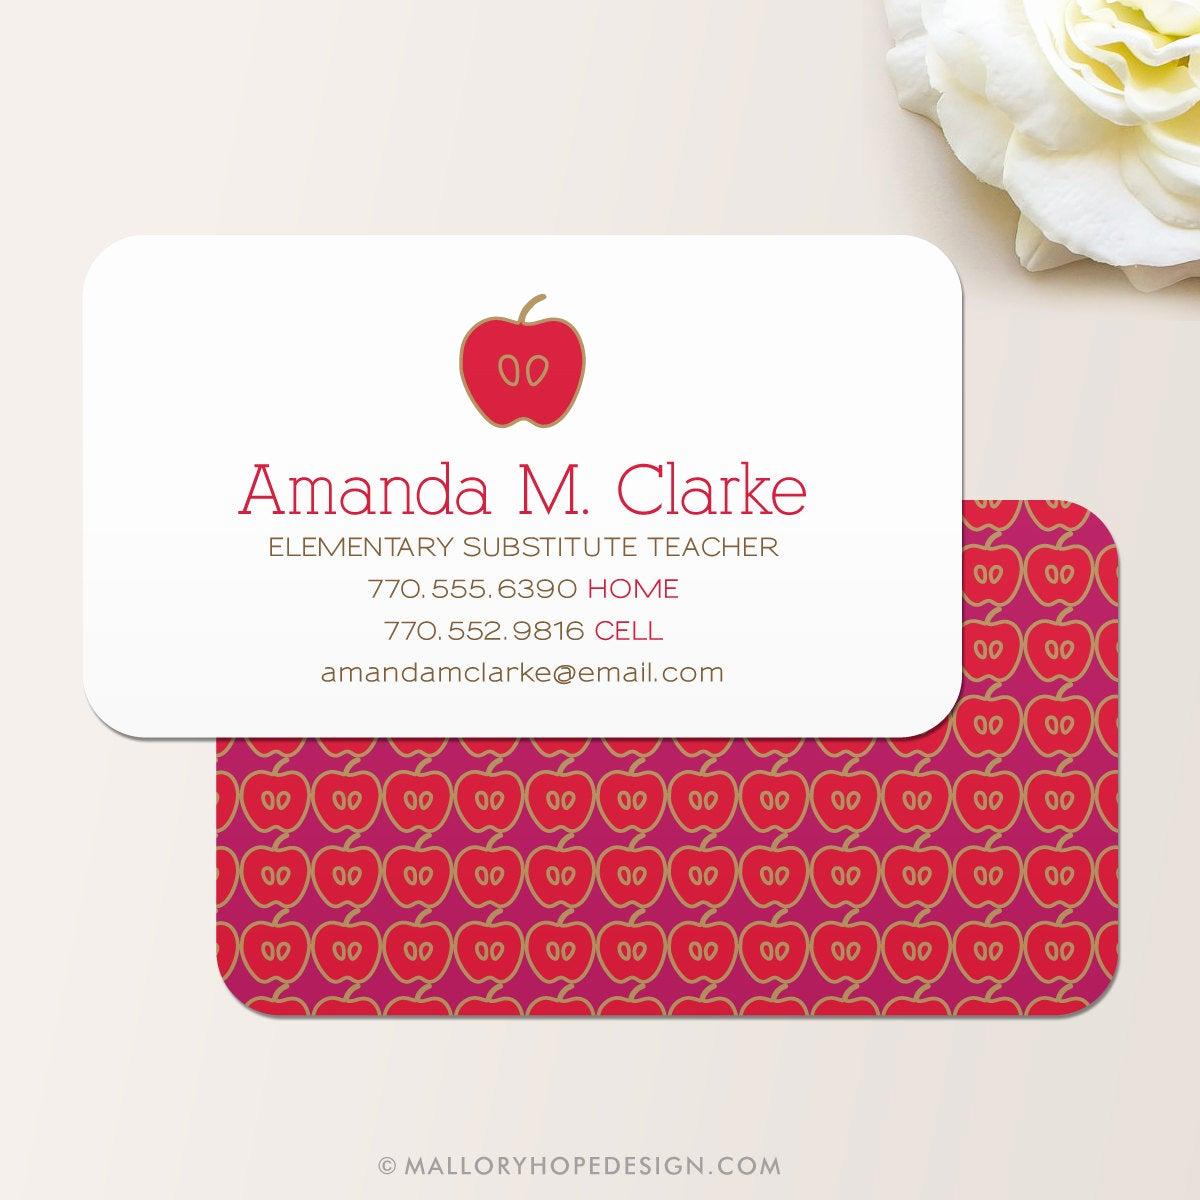 Substitute Teacher Business Cards Beautiful Teacher Business Card Calling Card Mommy Card Contact